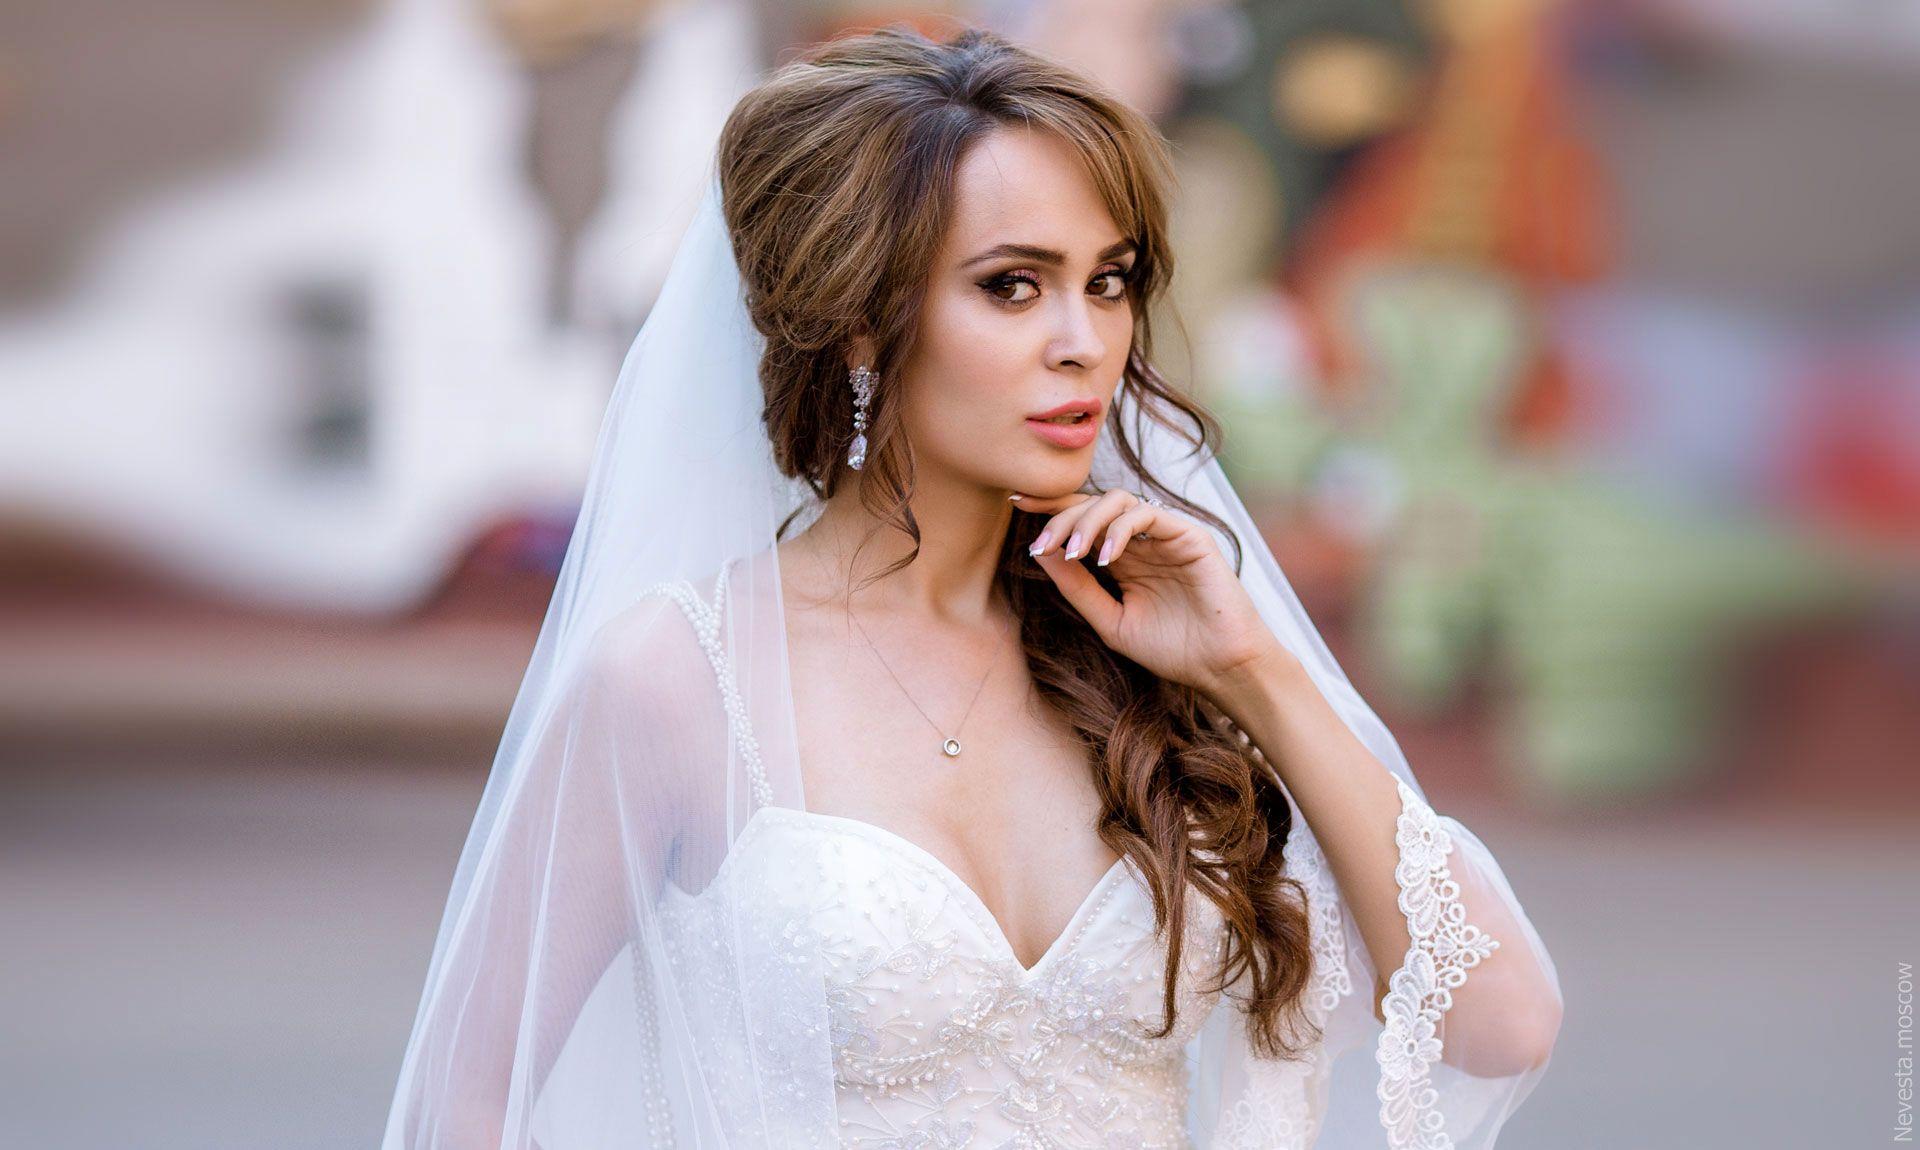 Актриса Анна Калашникова в образе белого лебедя фото 37